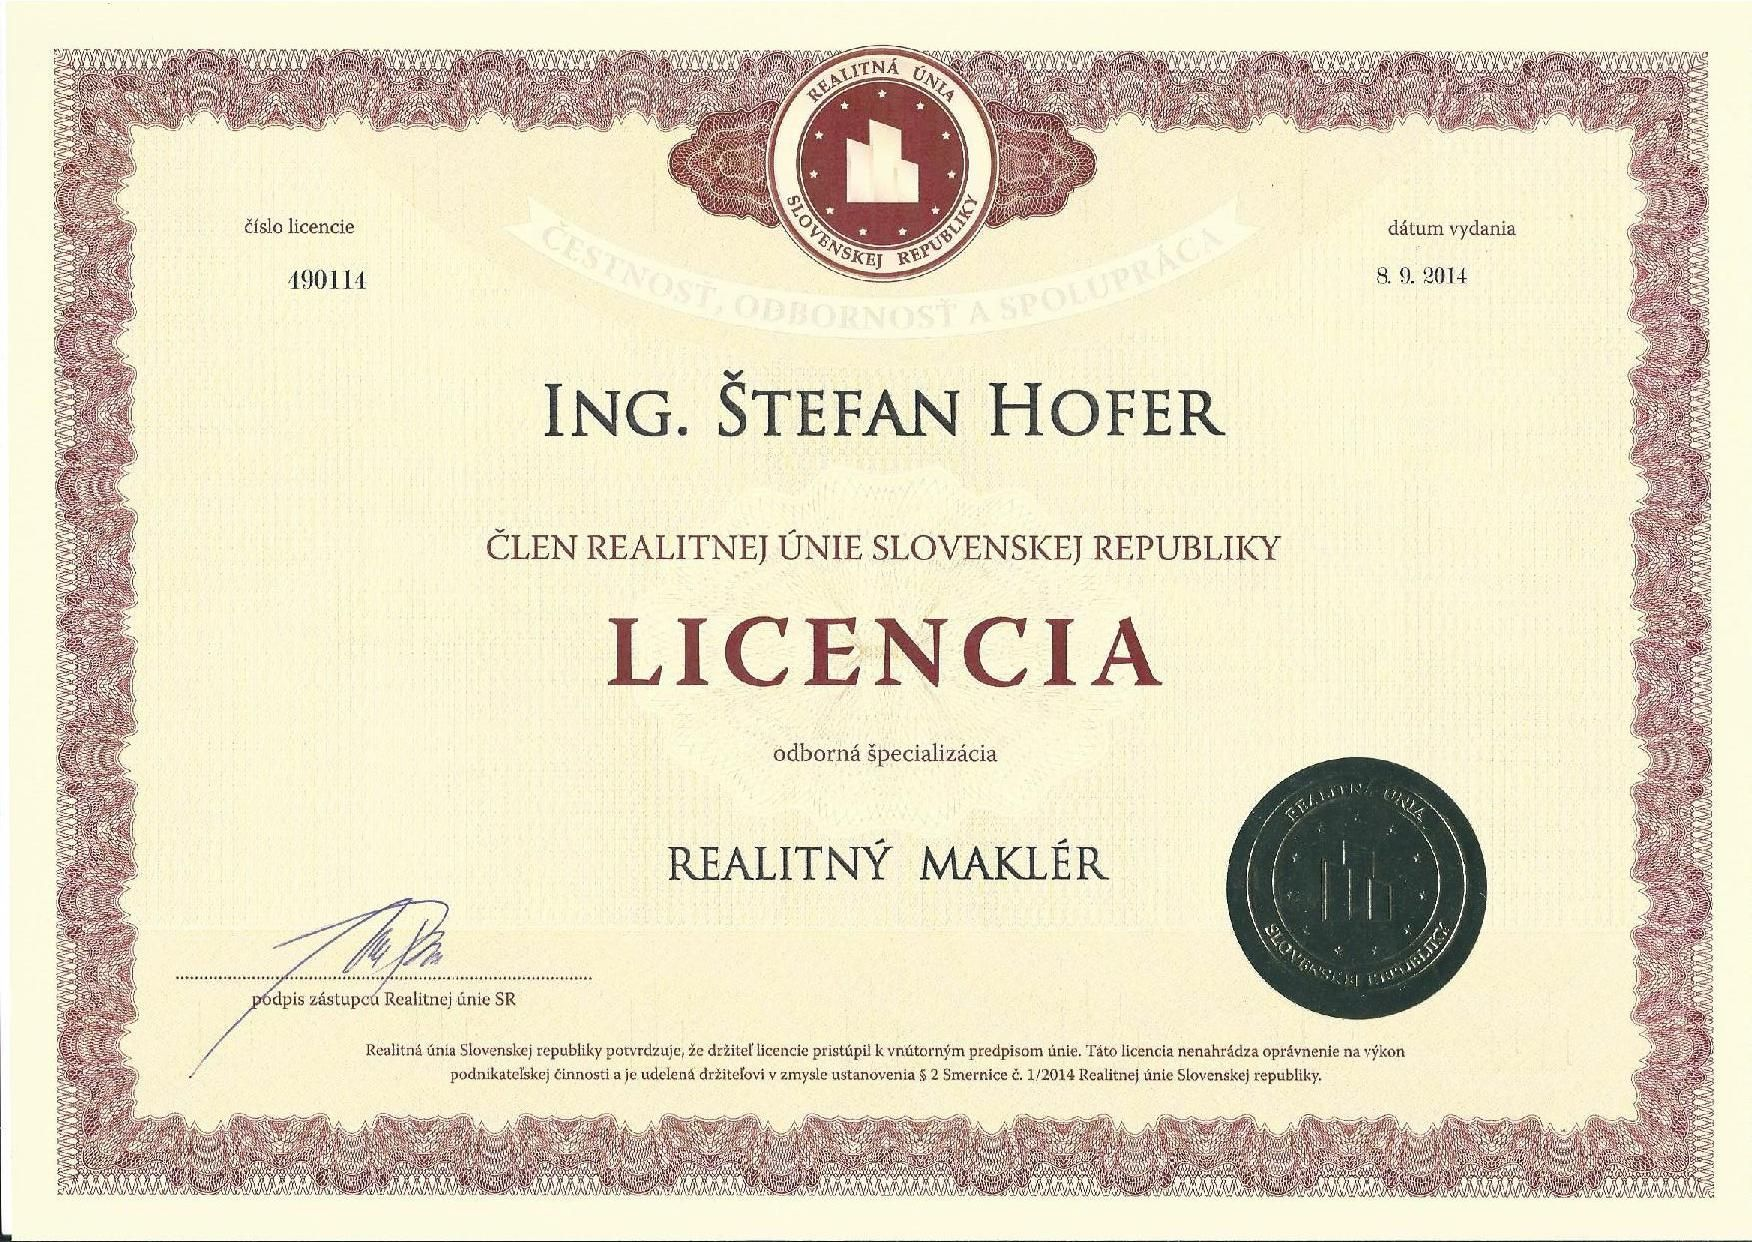 licencia_realitny_makler-001-001